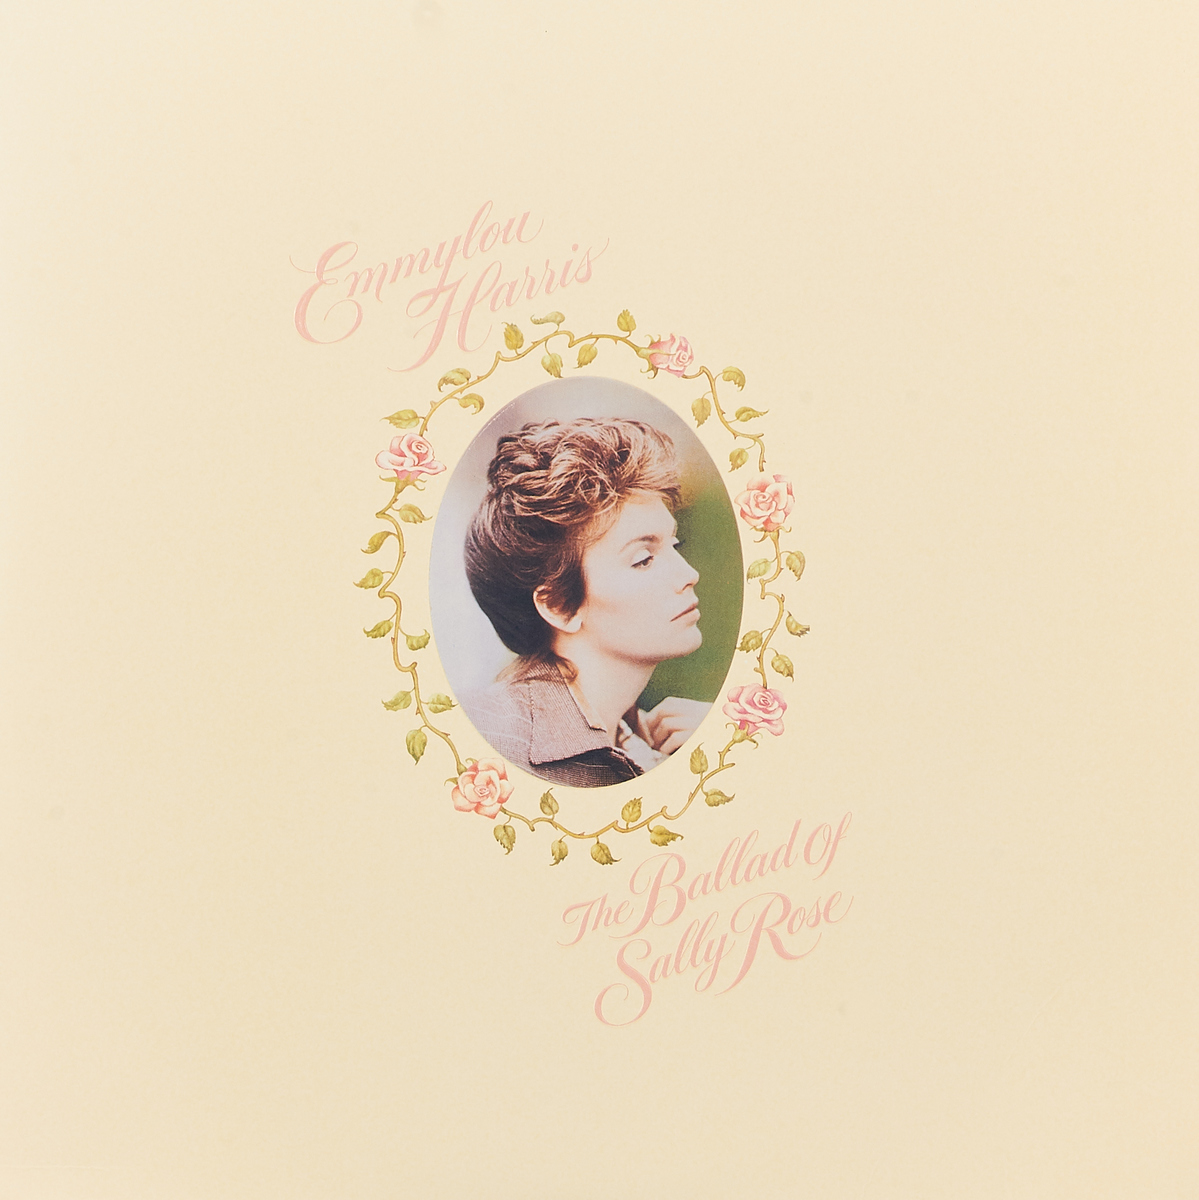 Эммилу Харрис Emmylou Harris. The Ballad Of Sally Rose (2 LP) стефон харрис stefon harris black action figure 2 lp